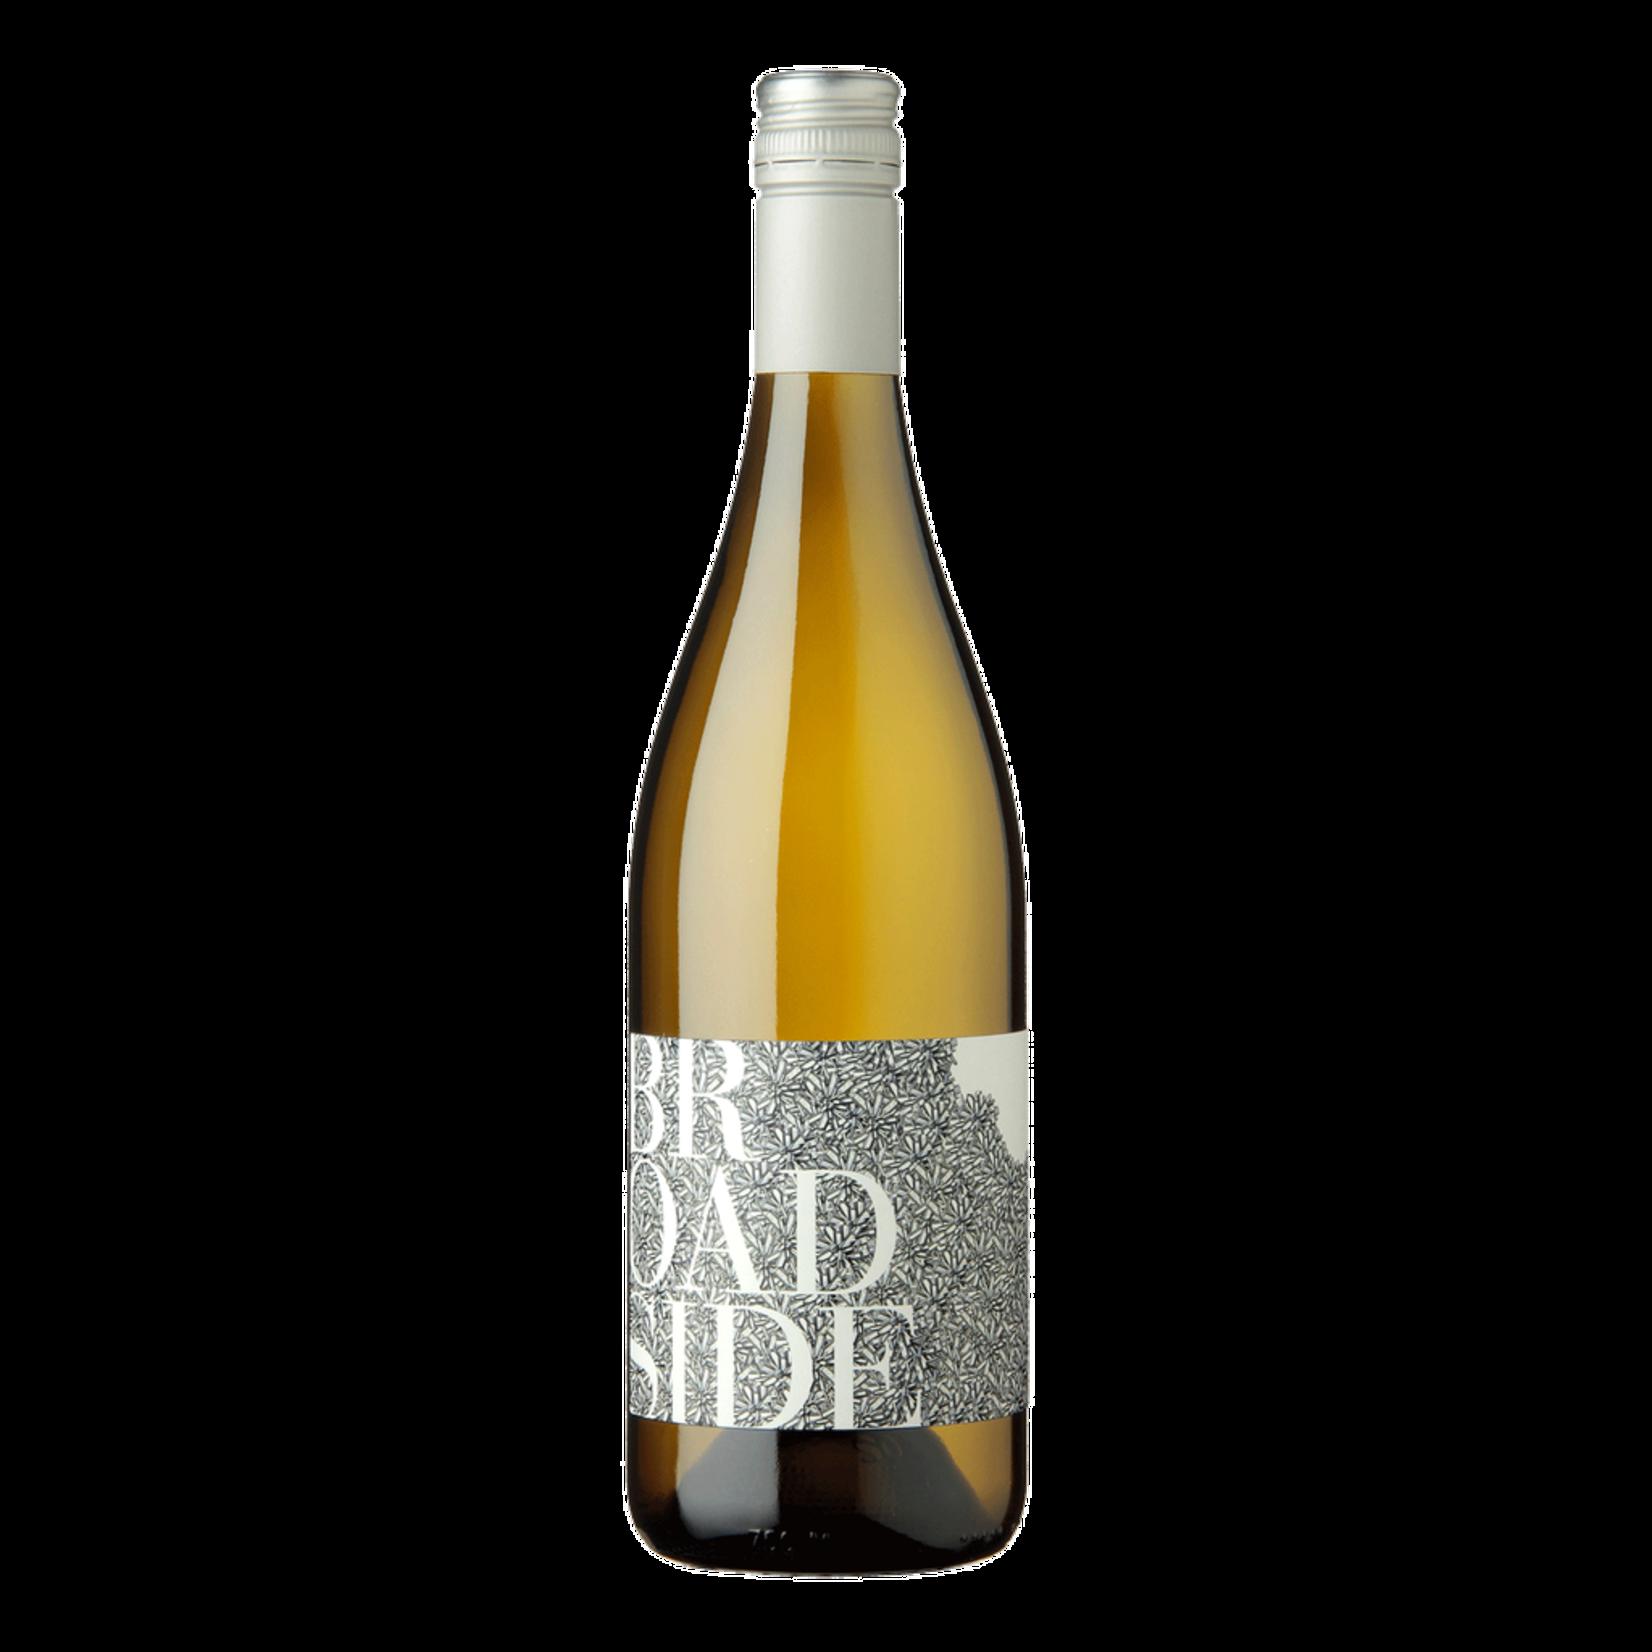 Wine Broadside Edna Valley Chardonnay Wild Ferment 2018